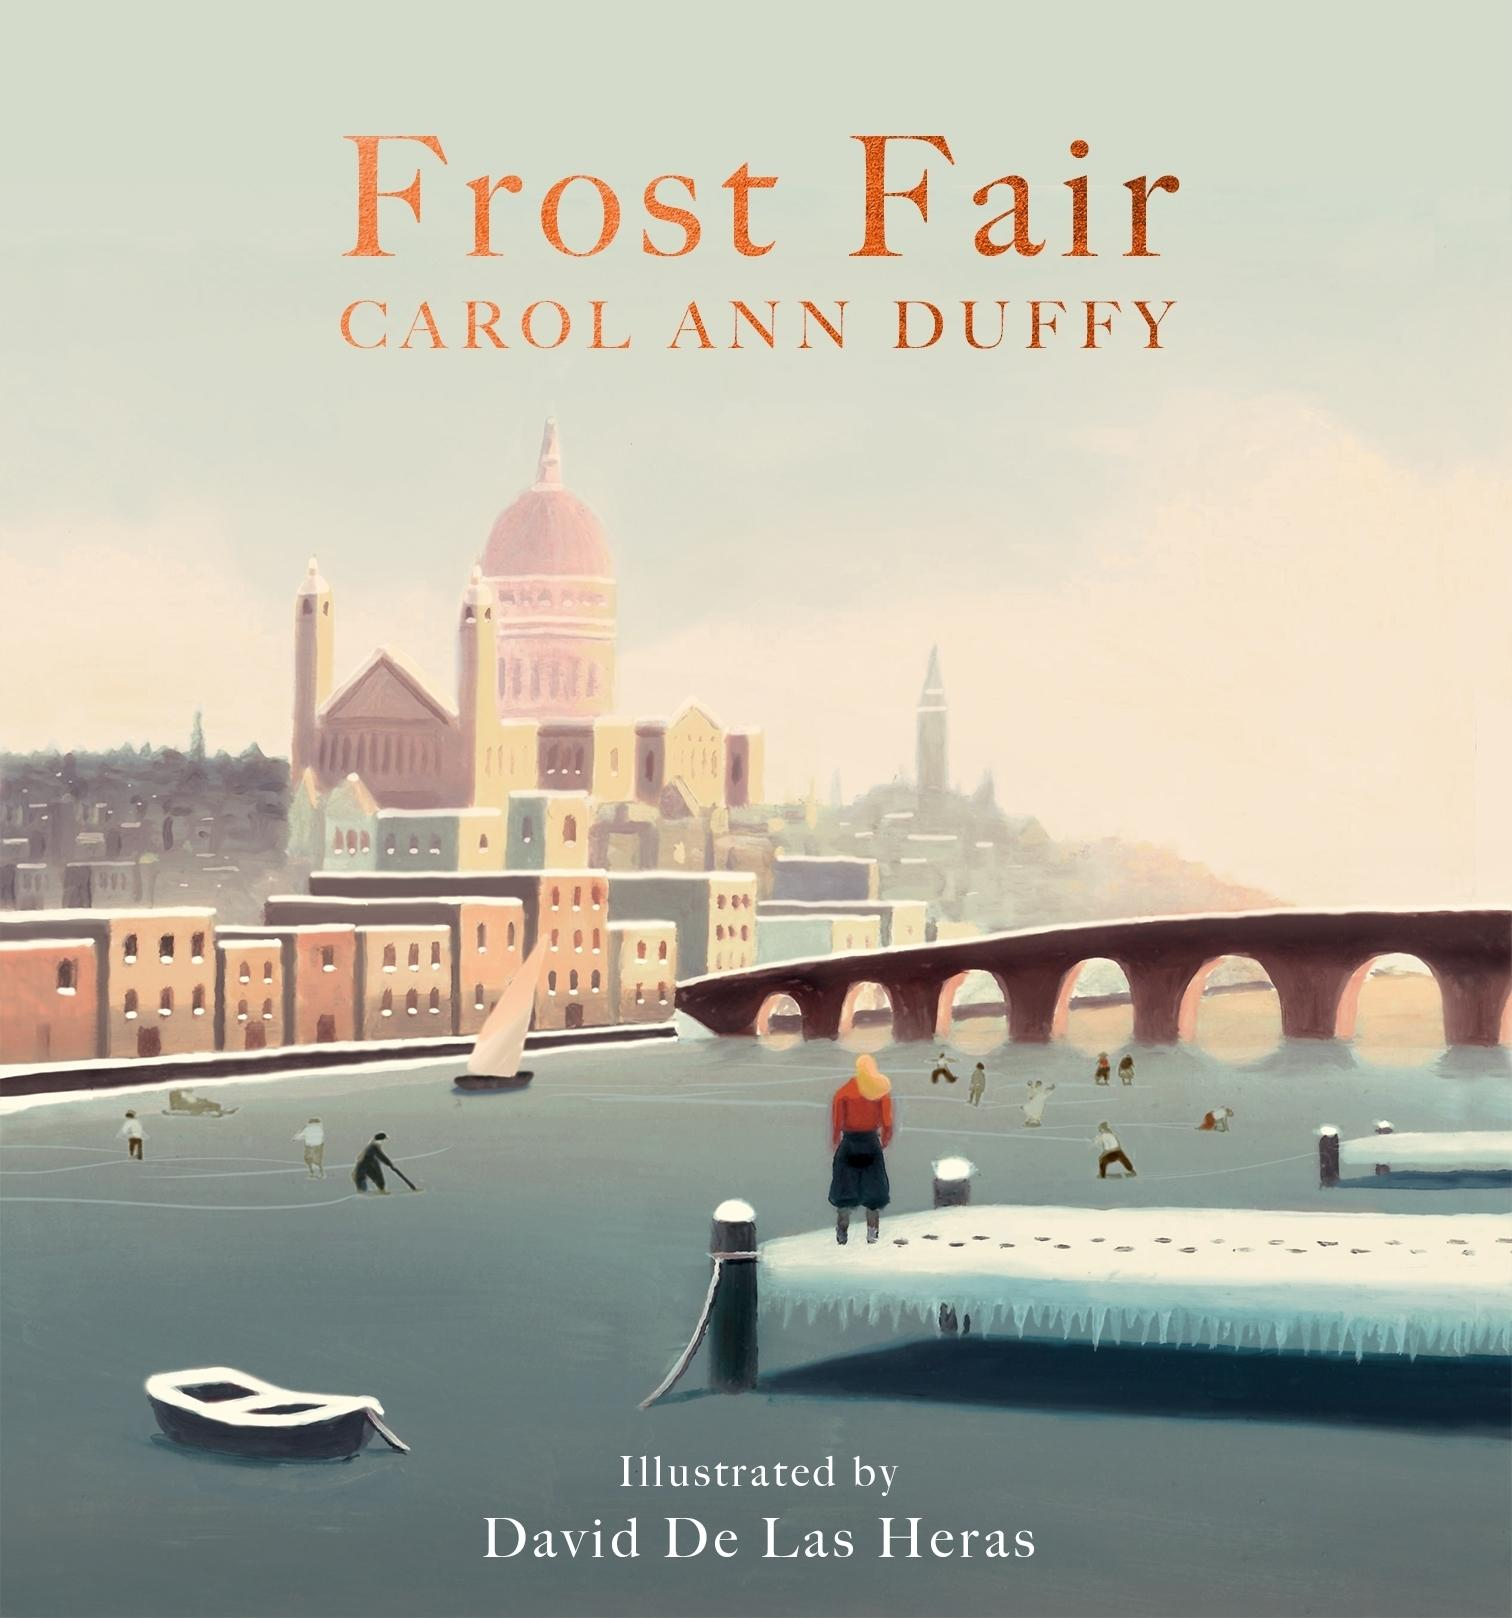 FrostFair